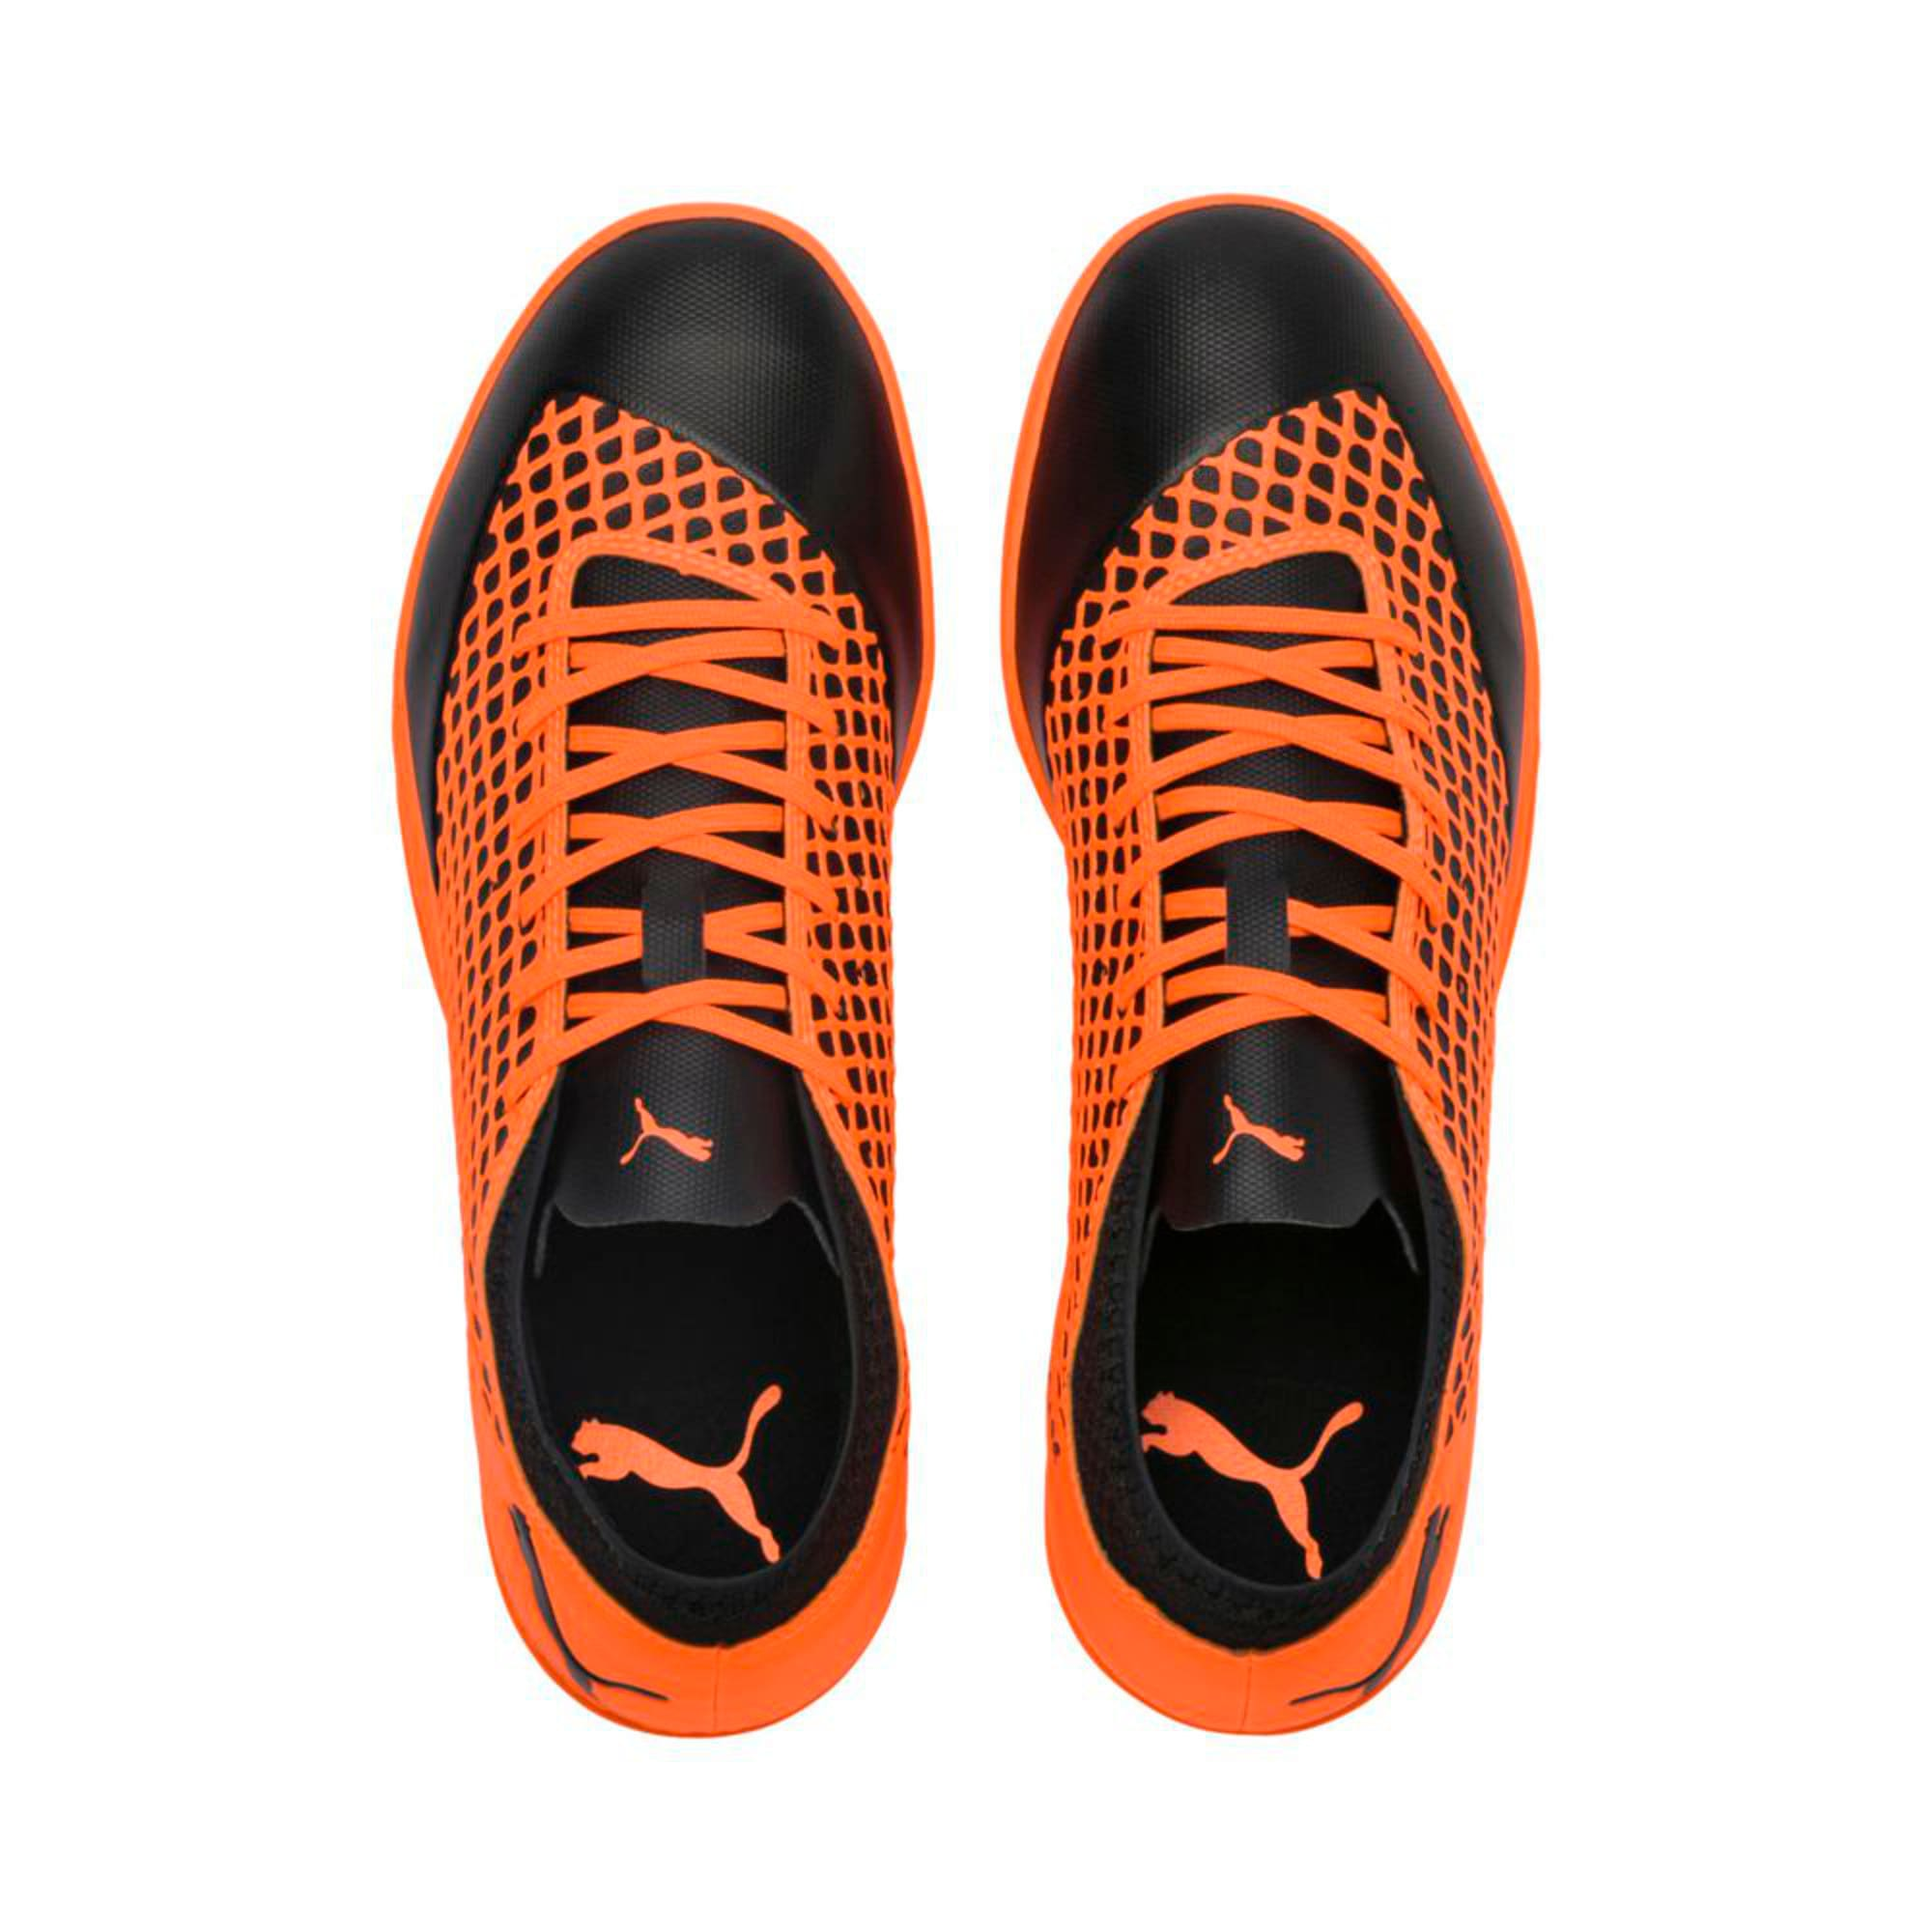 Thumbnail 4 of FUTURE 2.4 IT  Football Shoes, Black-Orange, medium-IND